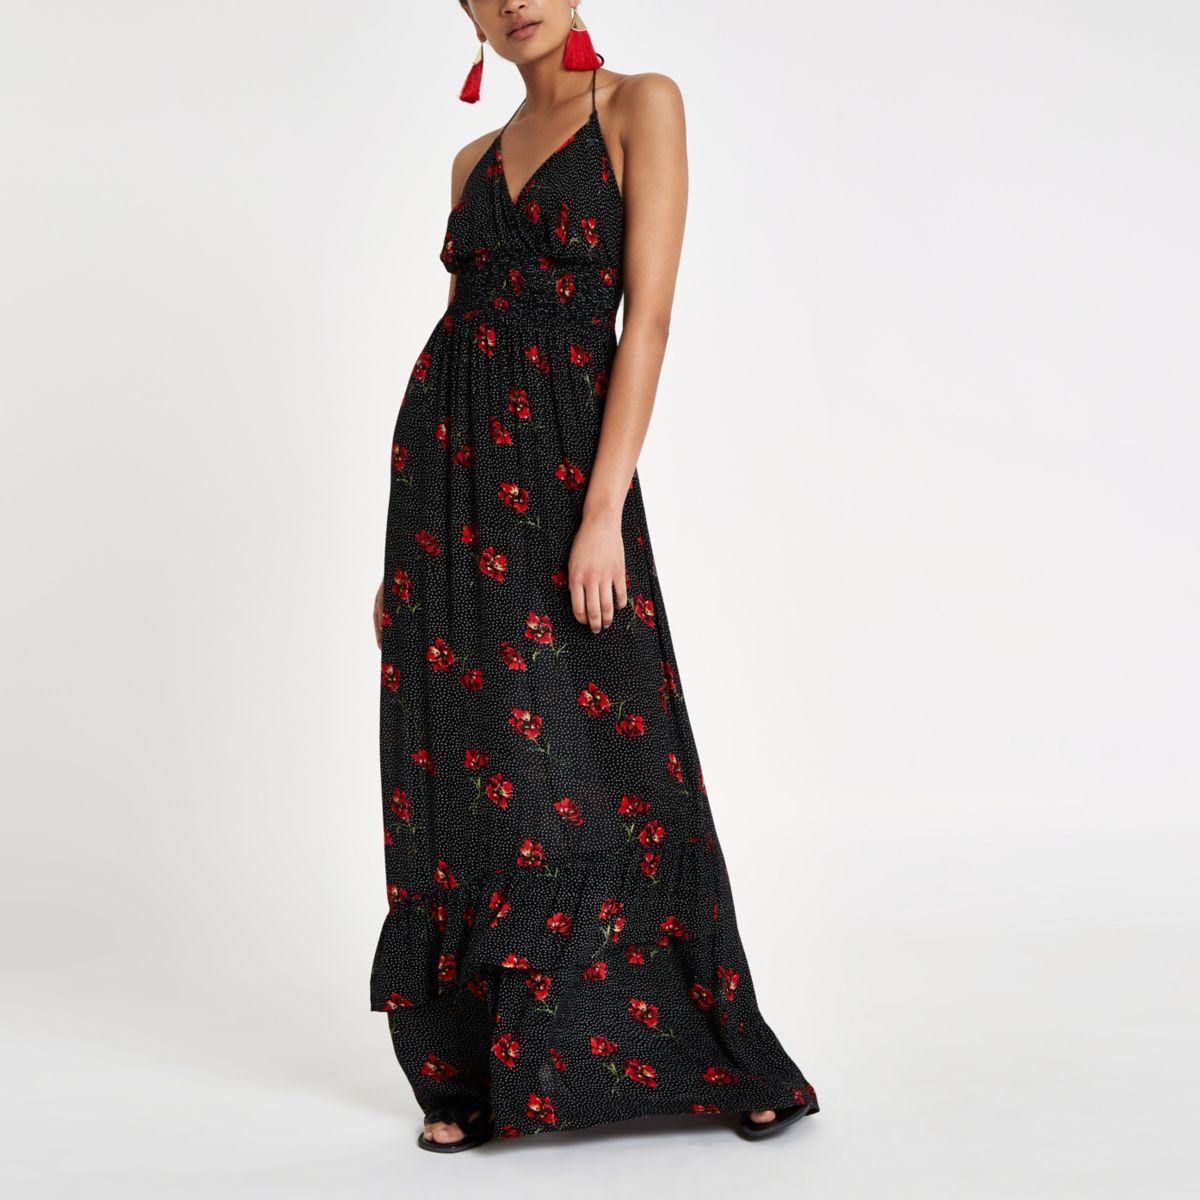 Black floral polka dot halter maxi dress